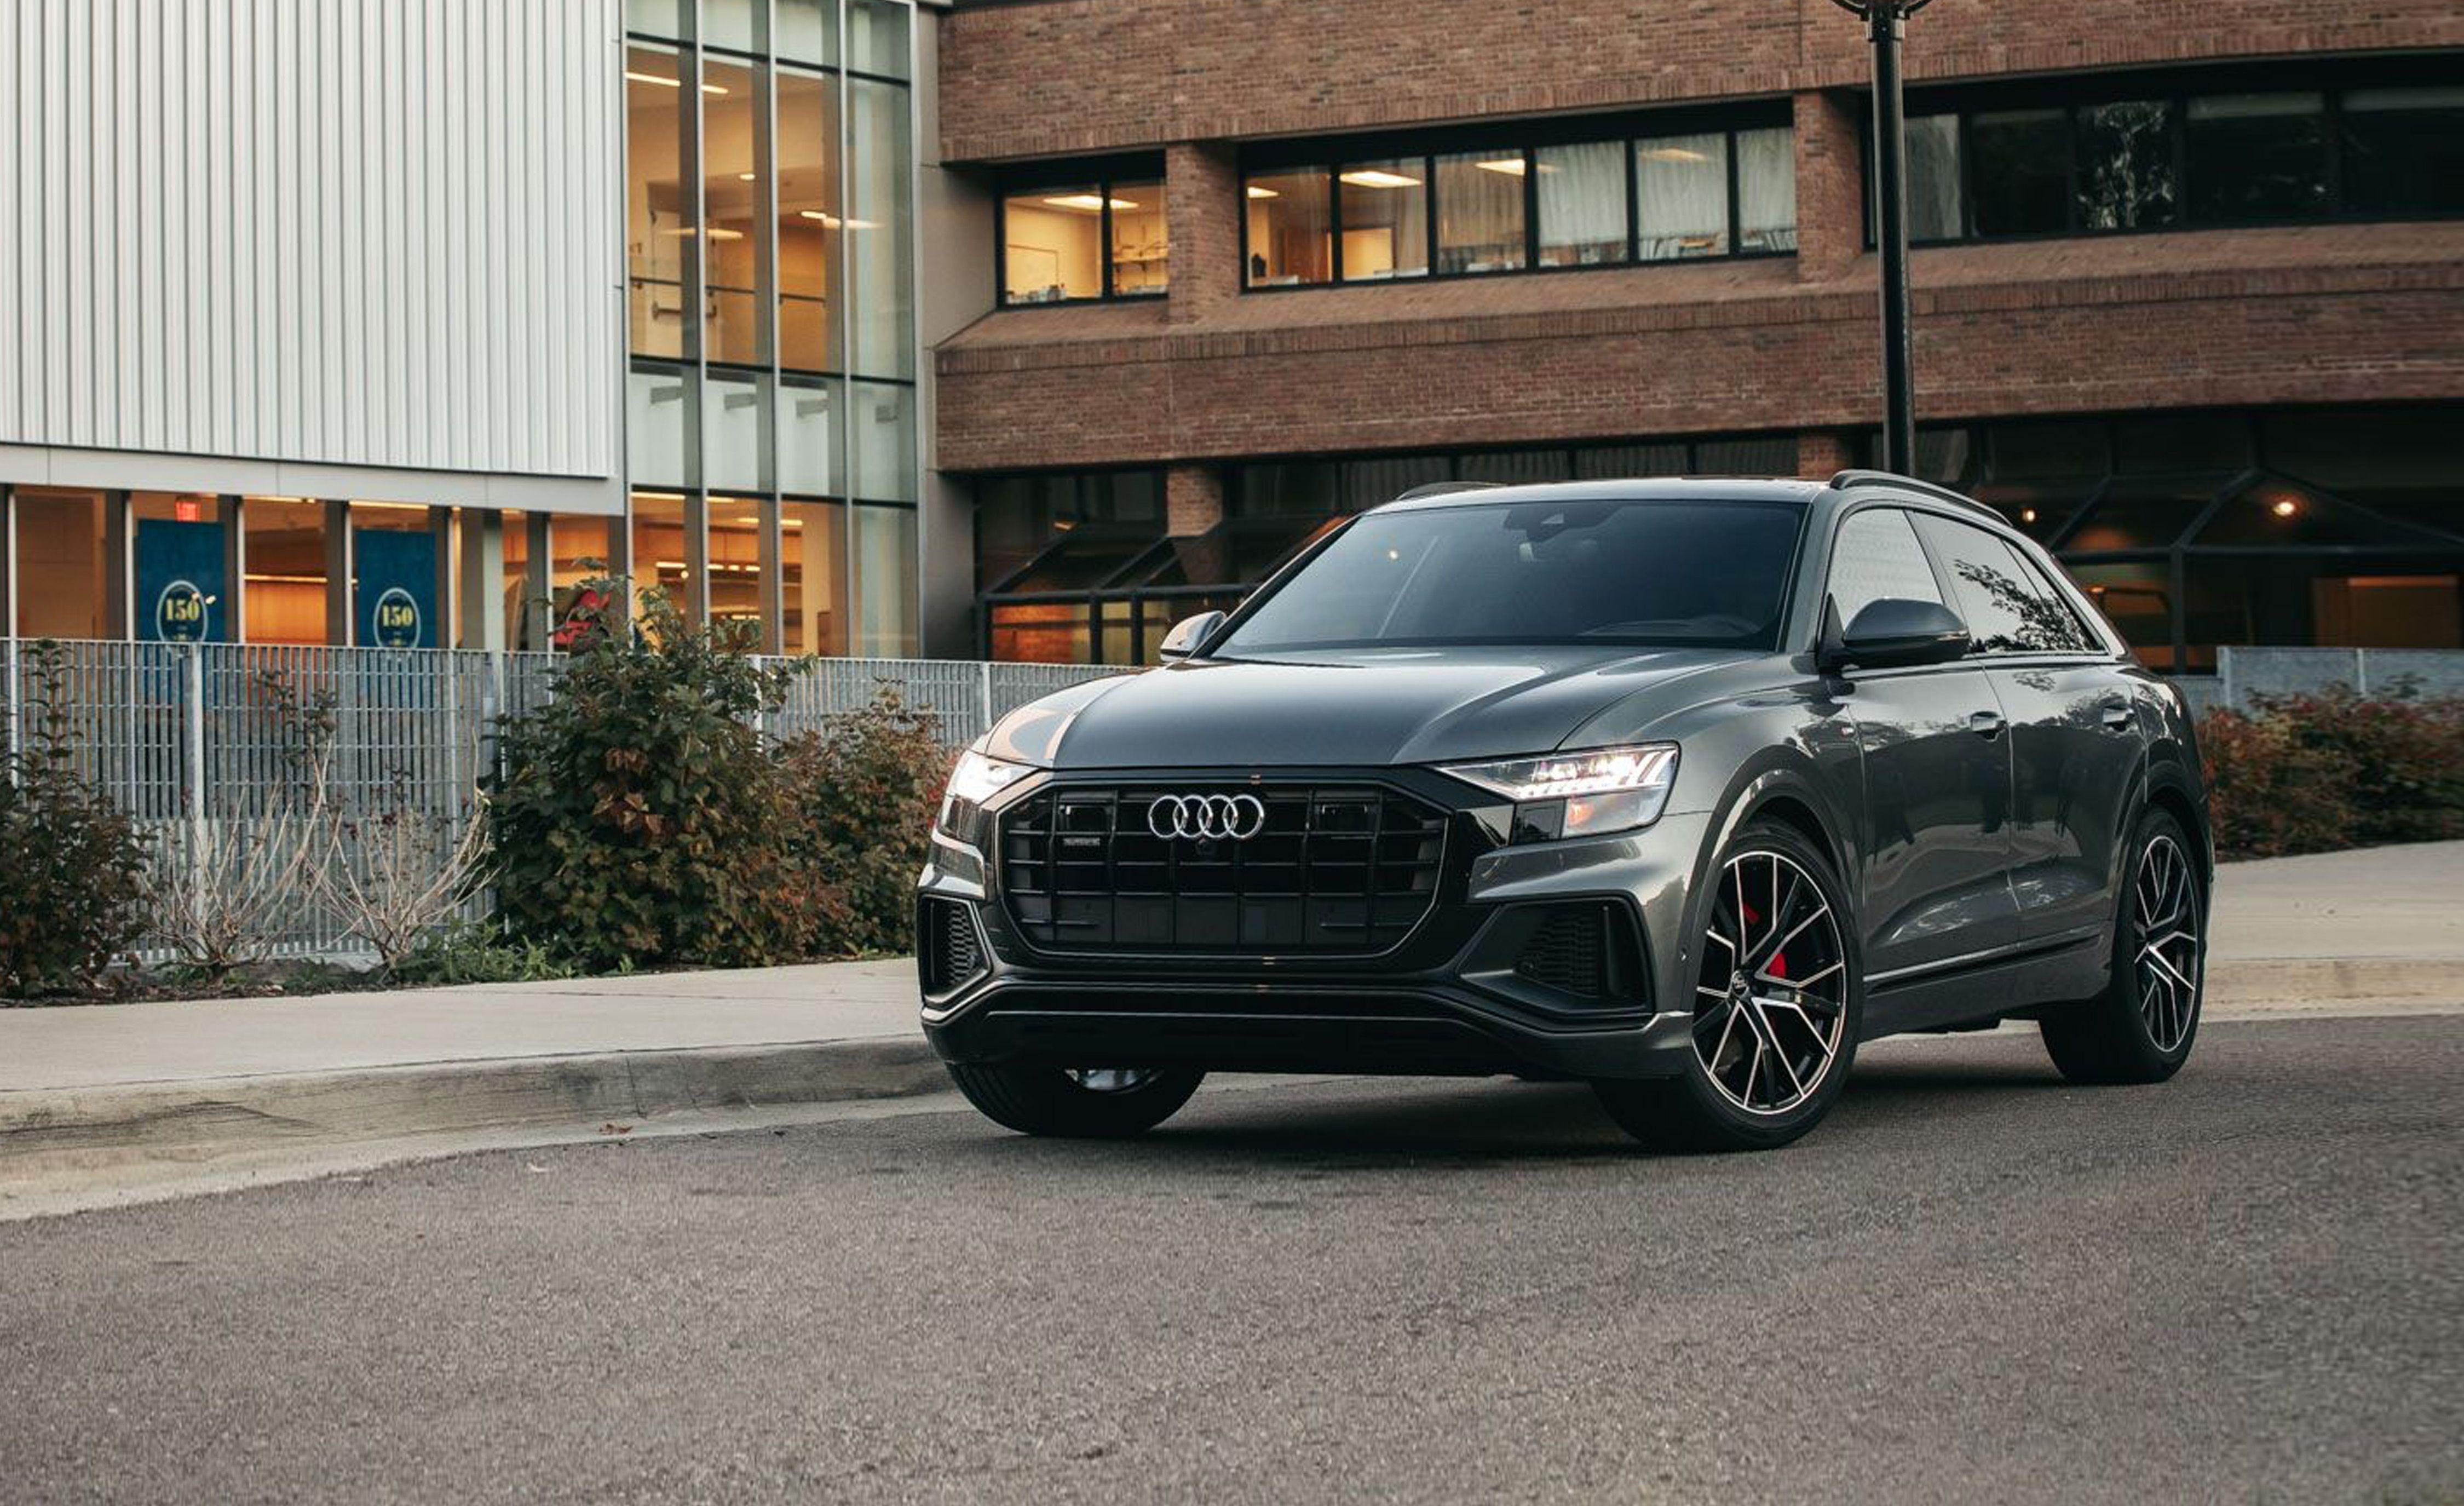 2019 Audi Q8 Reviews Audi Q8 Price Photos And Specs Car And Driver